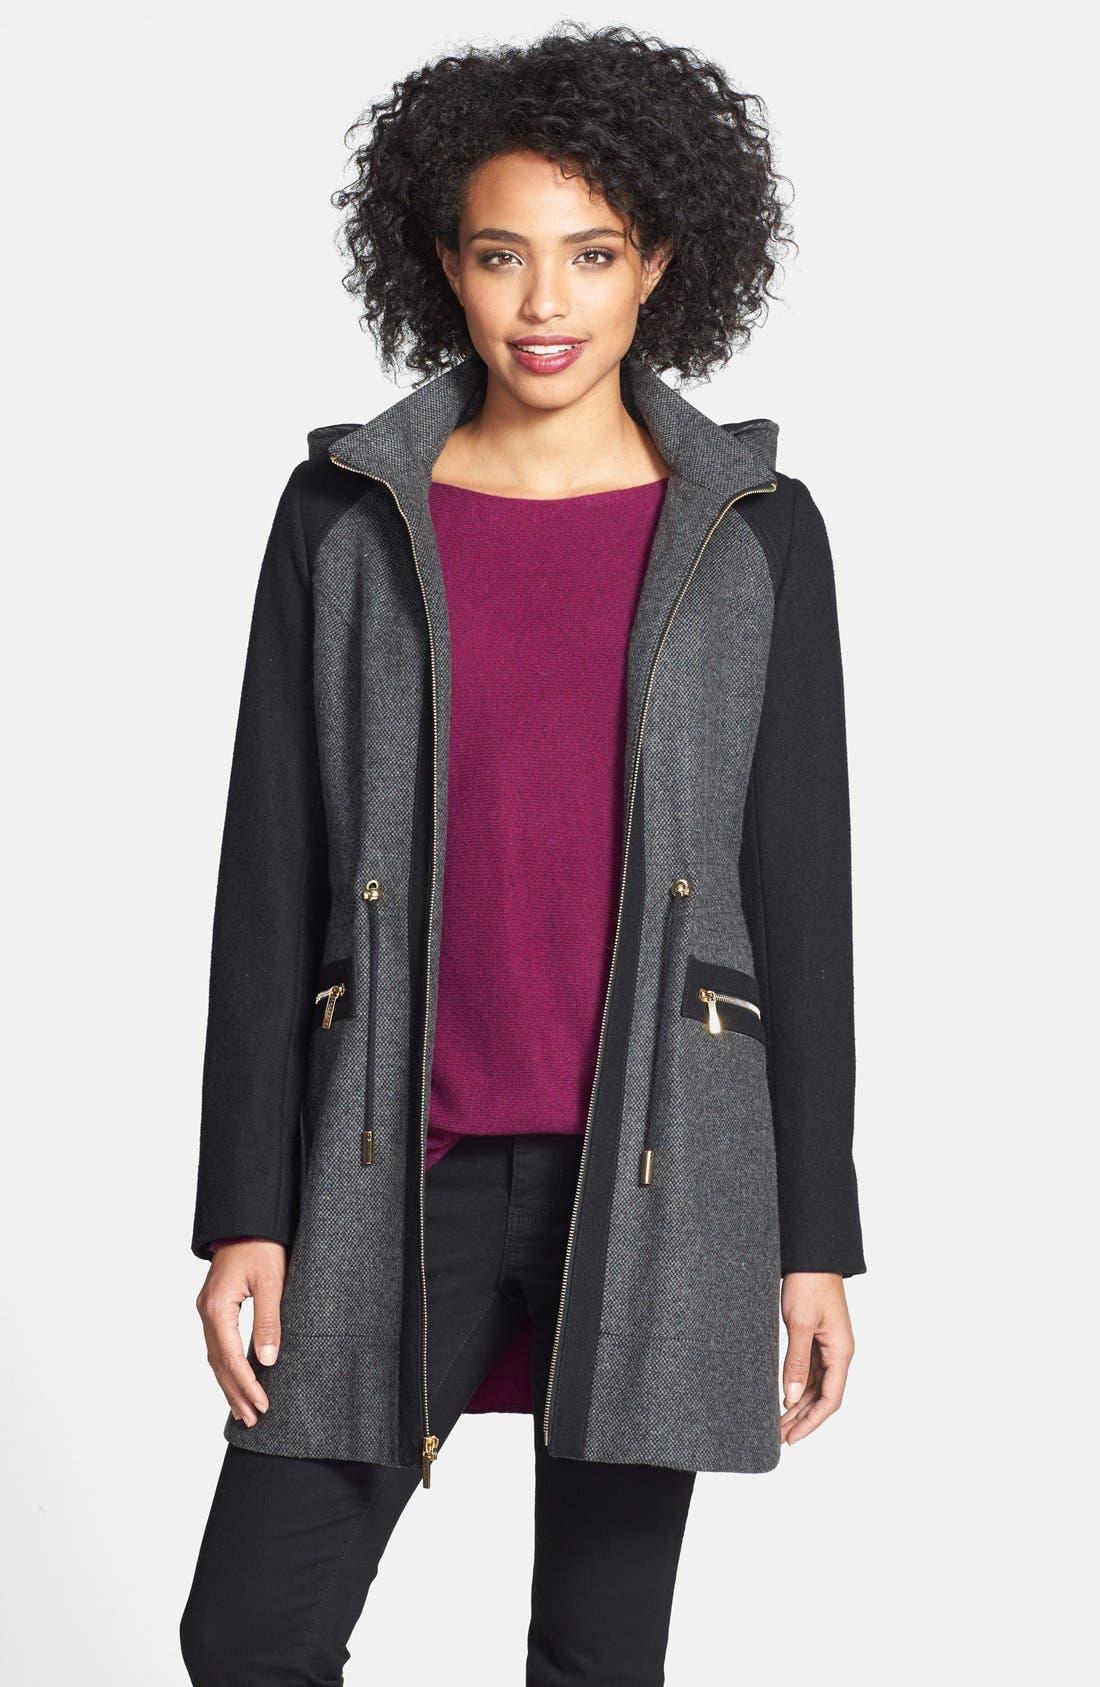 Main Image - Laundry by Shelli Segal Faux Fur Trim Colorblock Tweed Coat